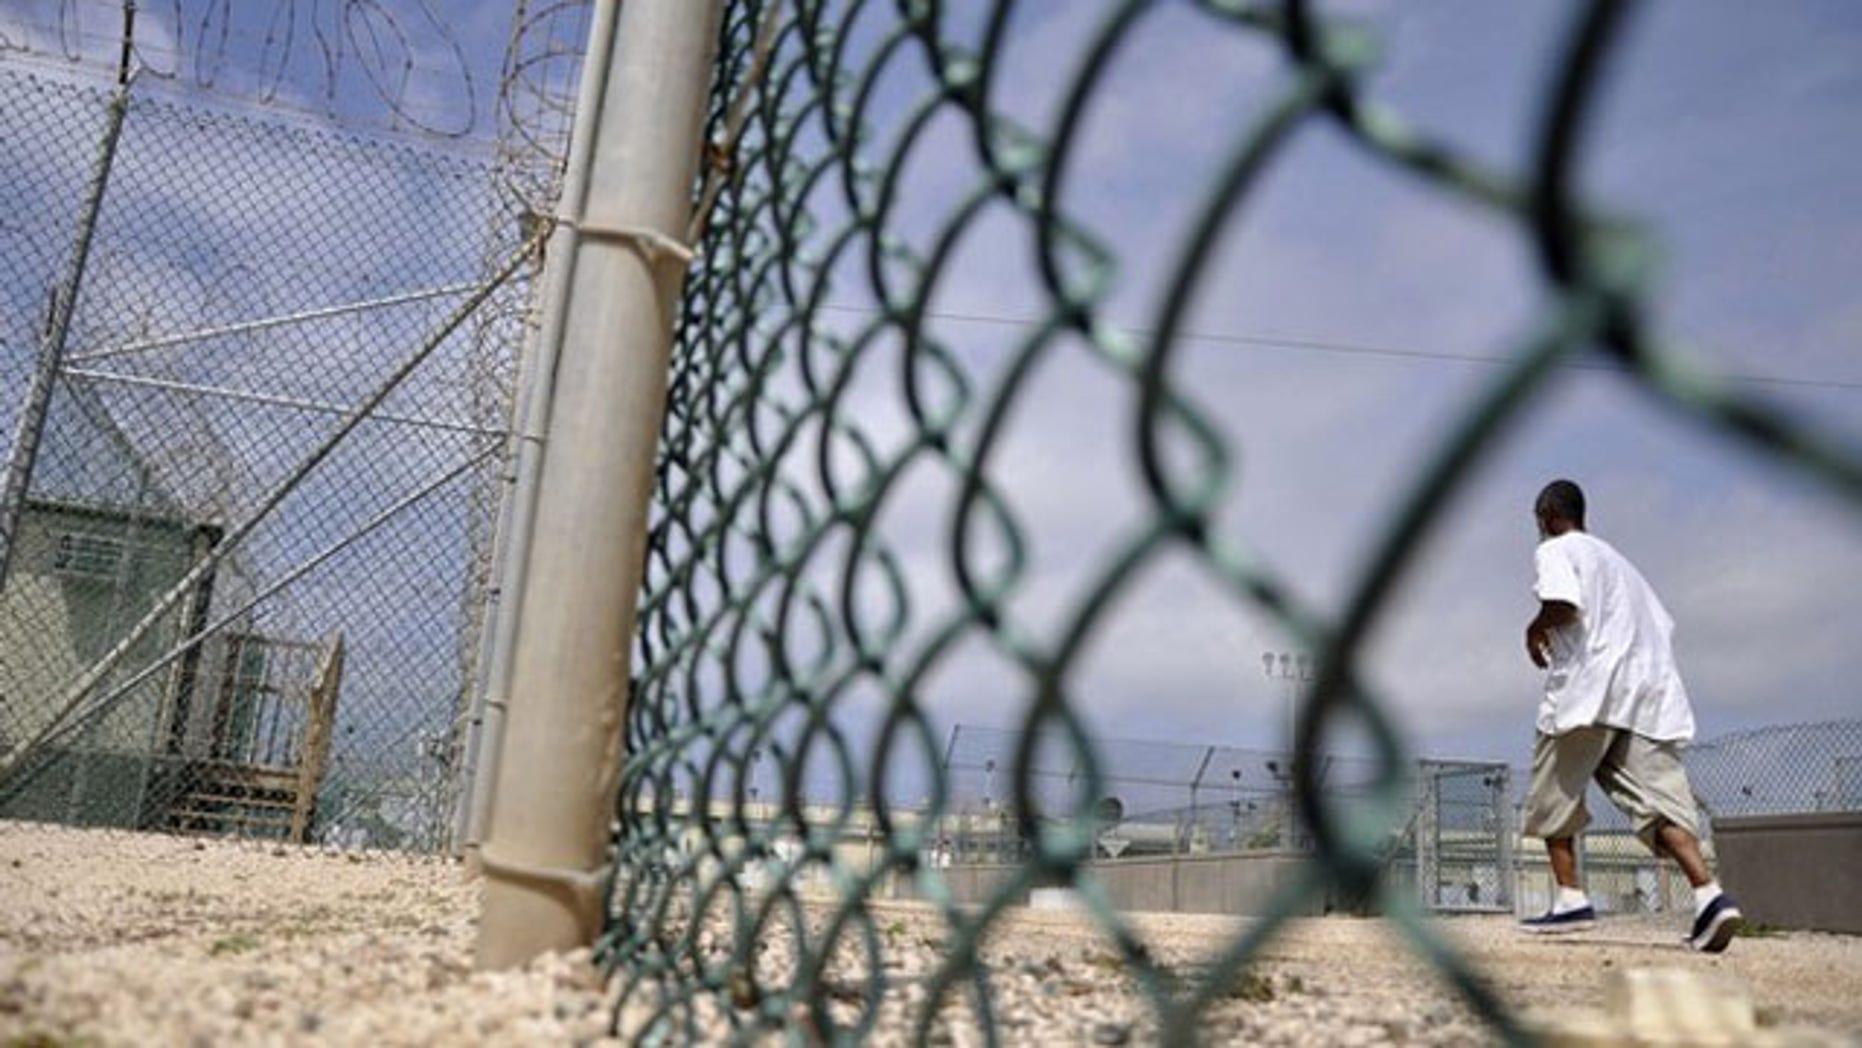 FILE: April 27, 2010: A Guantanamo detainee exercising inside the detention facility, at Guantanamo Bay U.S. Naval Base, Cuba.